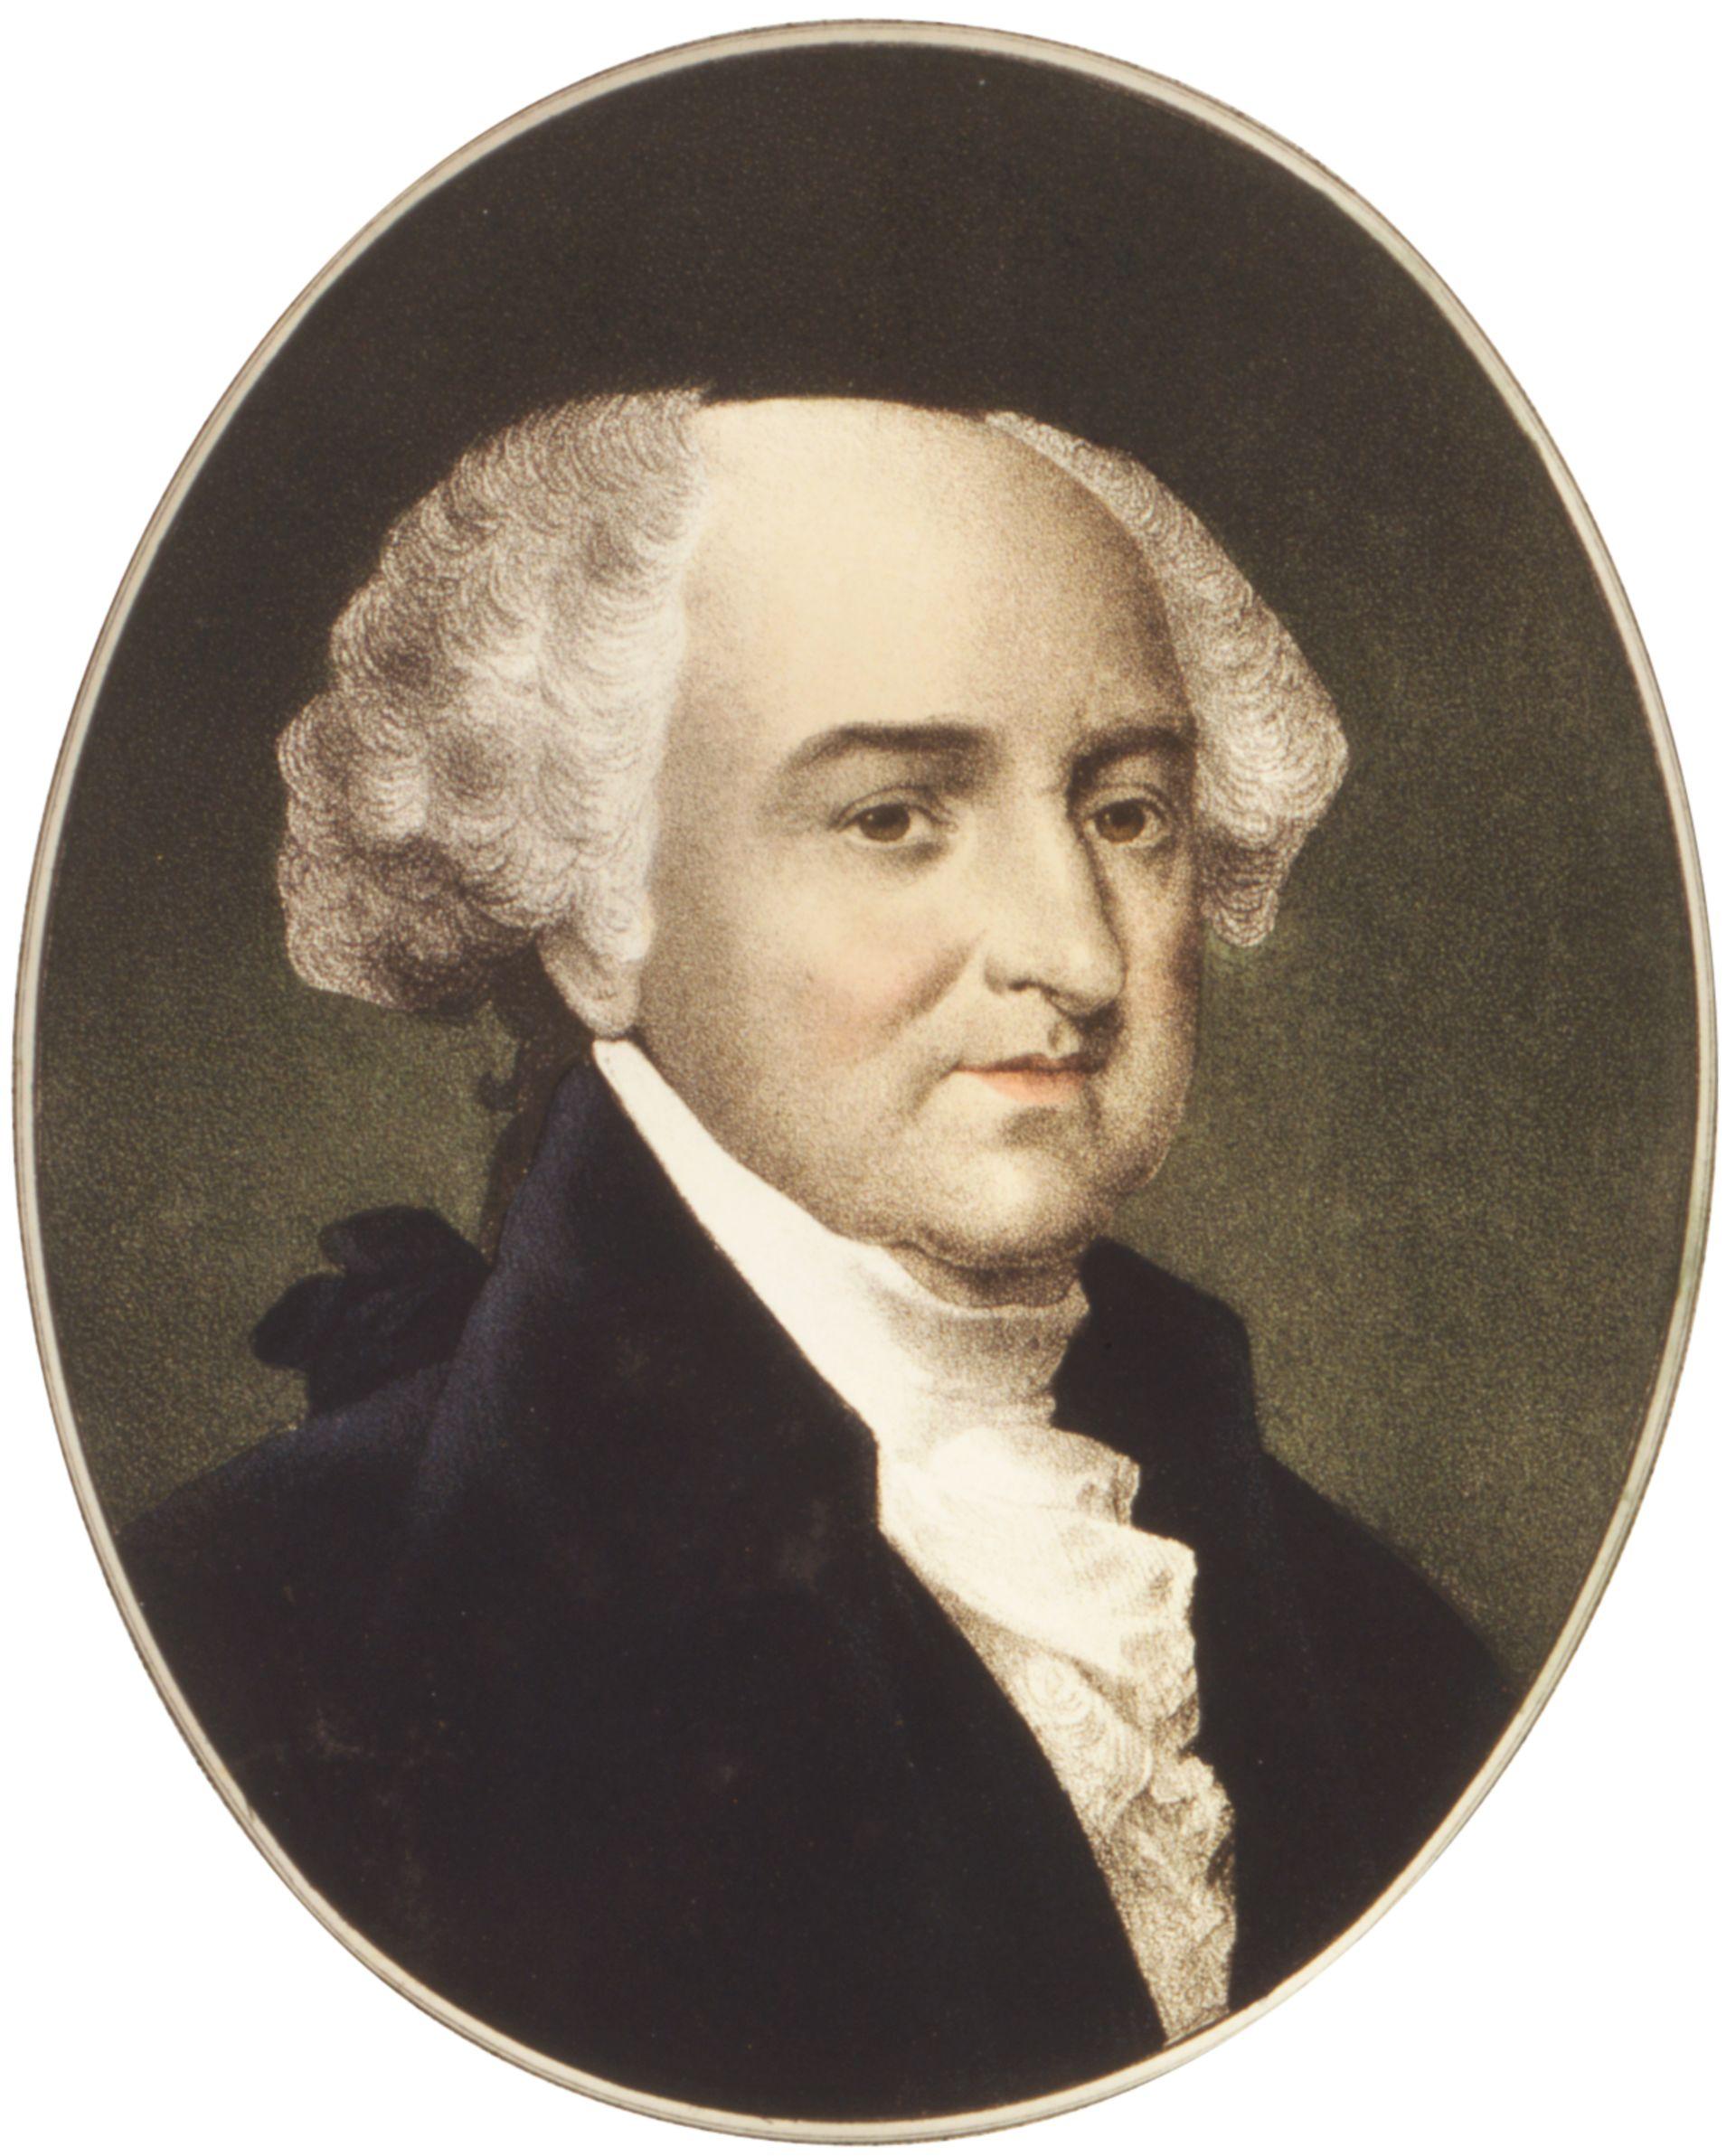 Foreign Affairs Auto >> John Adams Facts | President John Adams | DK Find Out